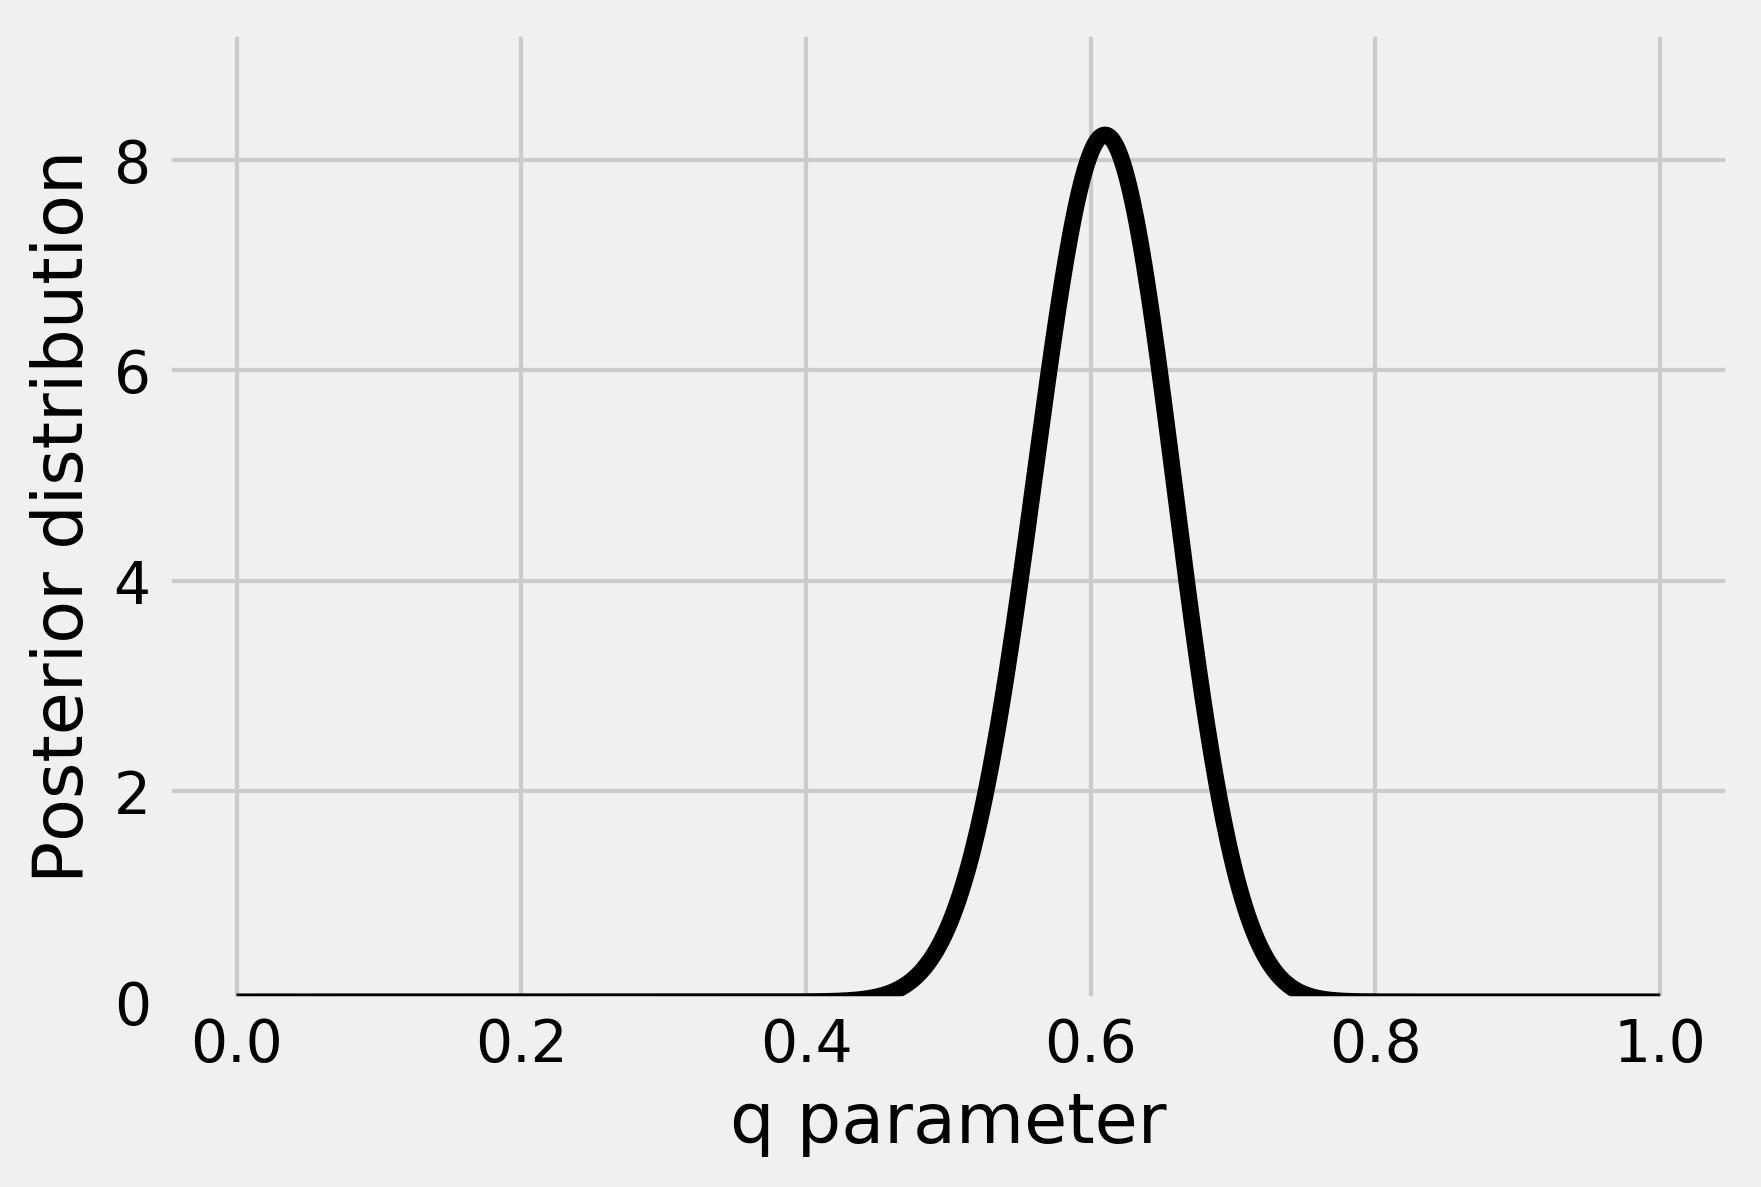 Posterior distribution